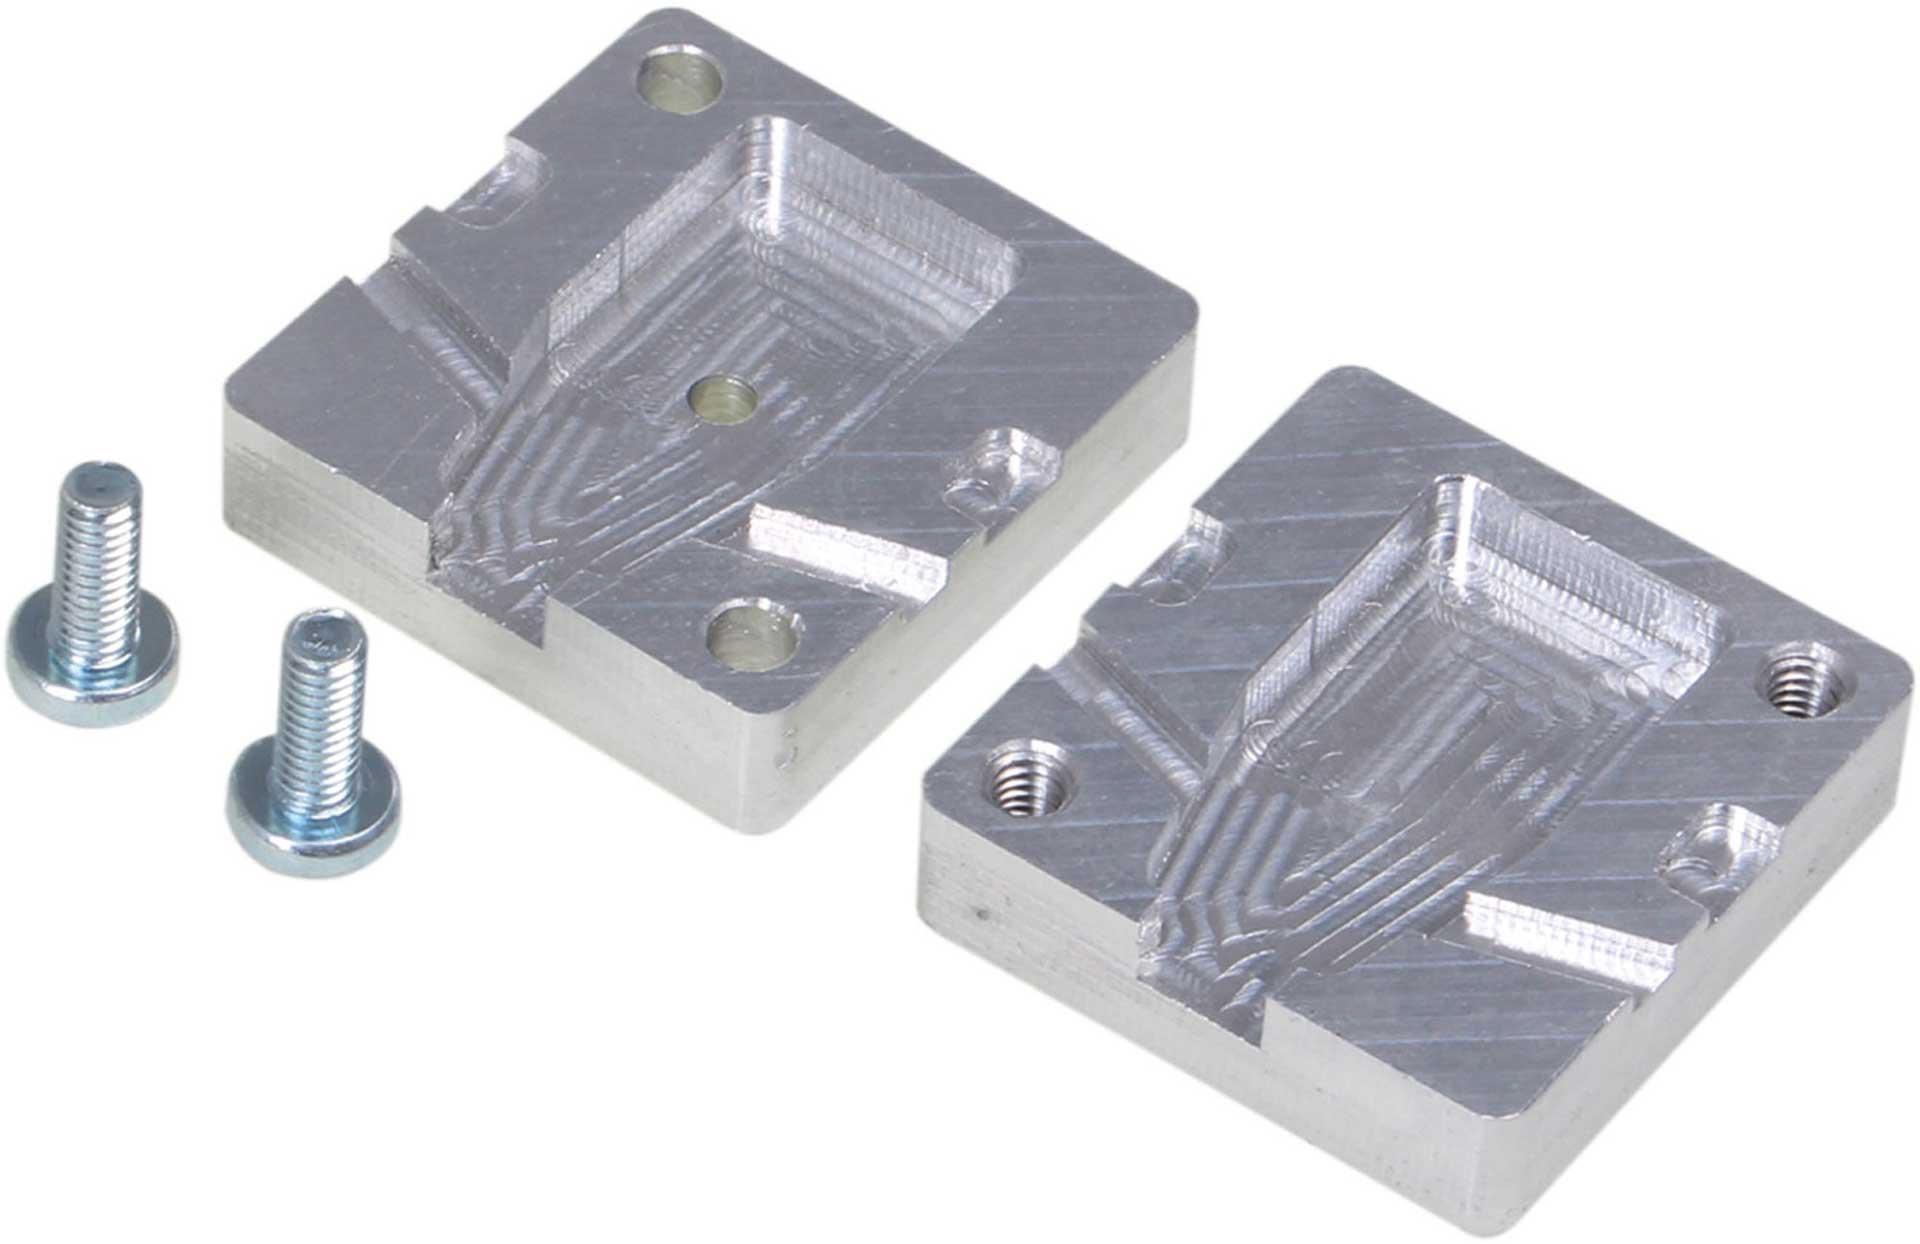 Robbe Modellsport CNC GIEßFORM ALU MPX STECKER 6-POL